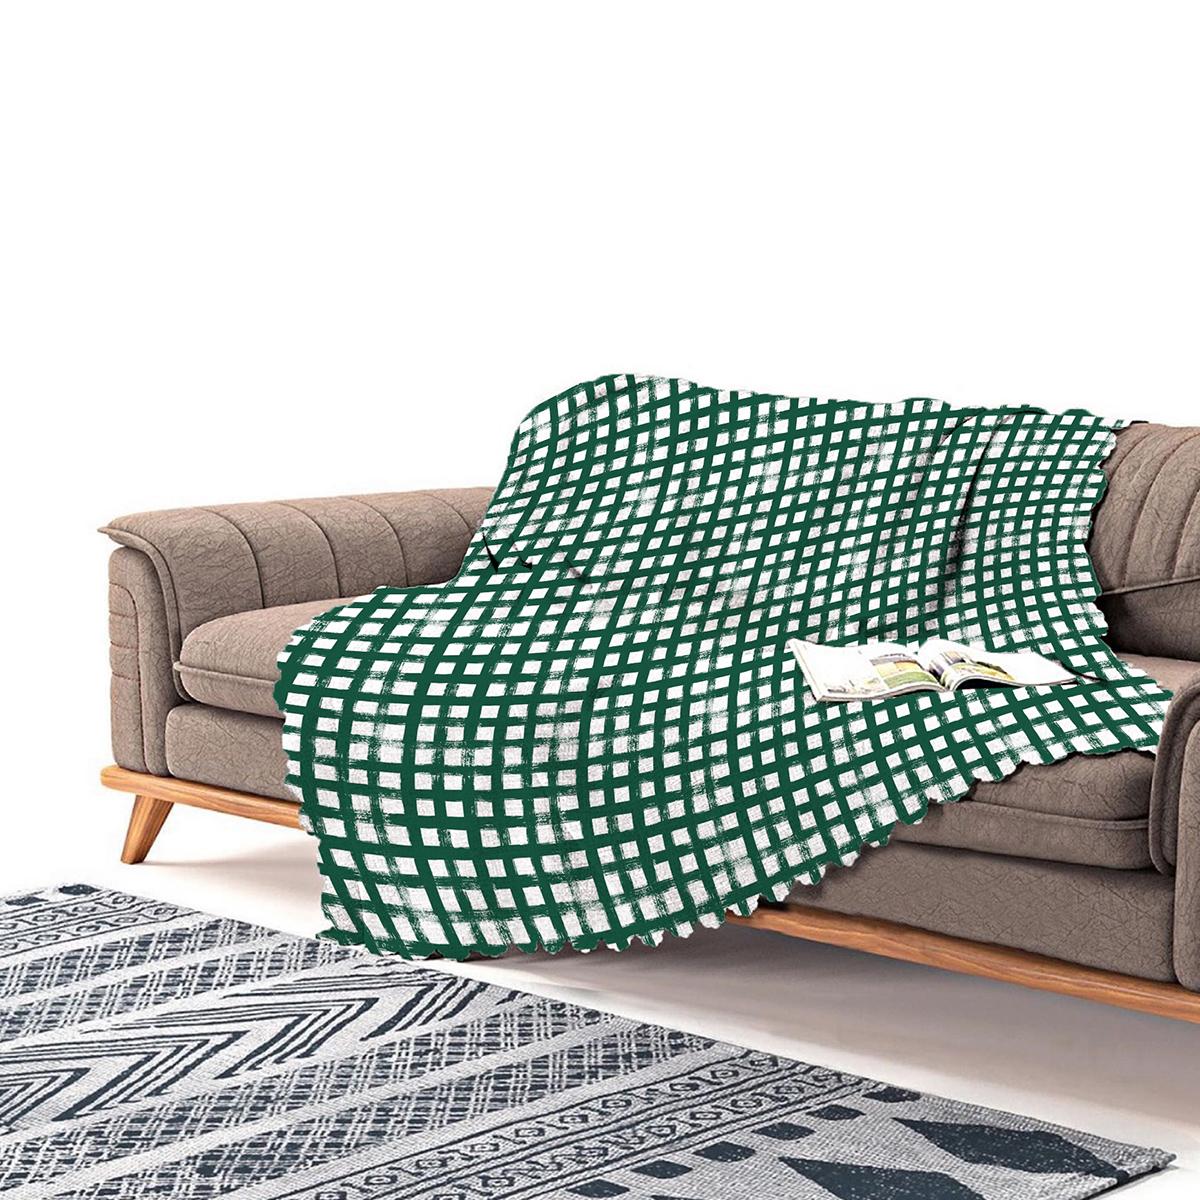 Realhomes Koyu Yeşil Geometrik Kare Motifli Modern Şönil Koltuk Örtüsü Realhomes